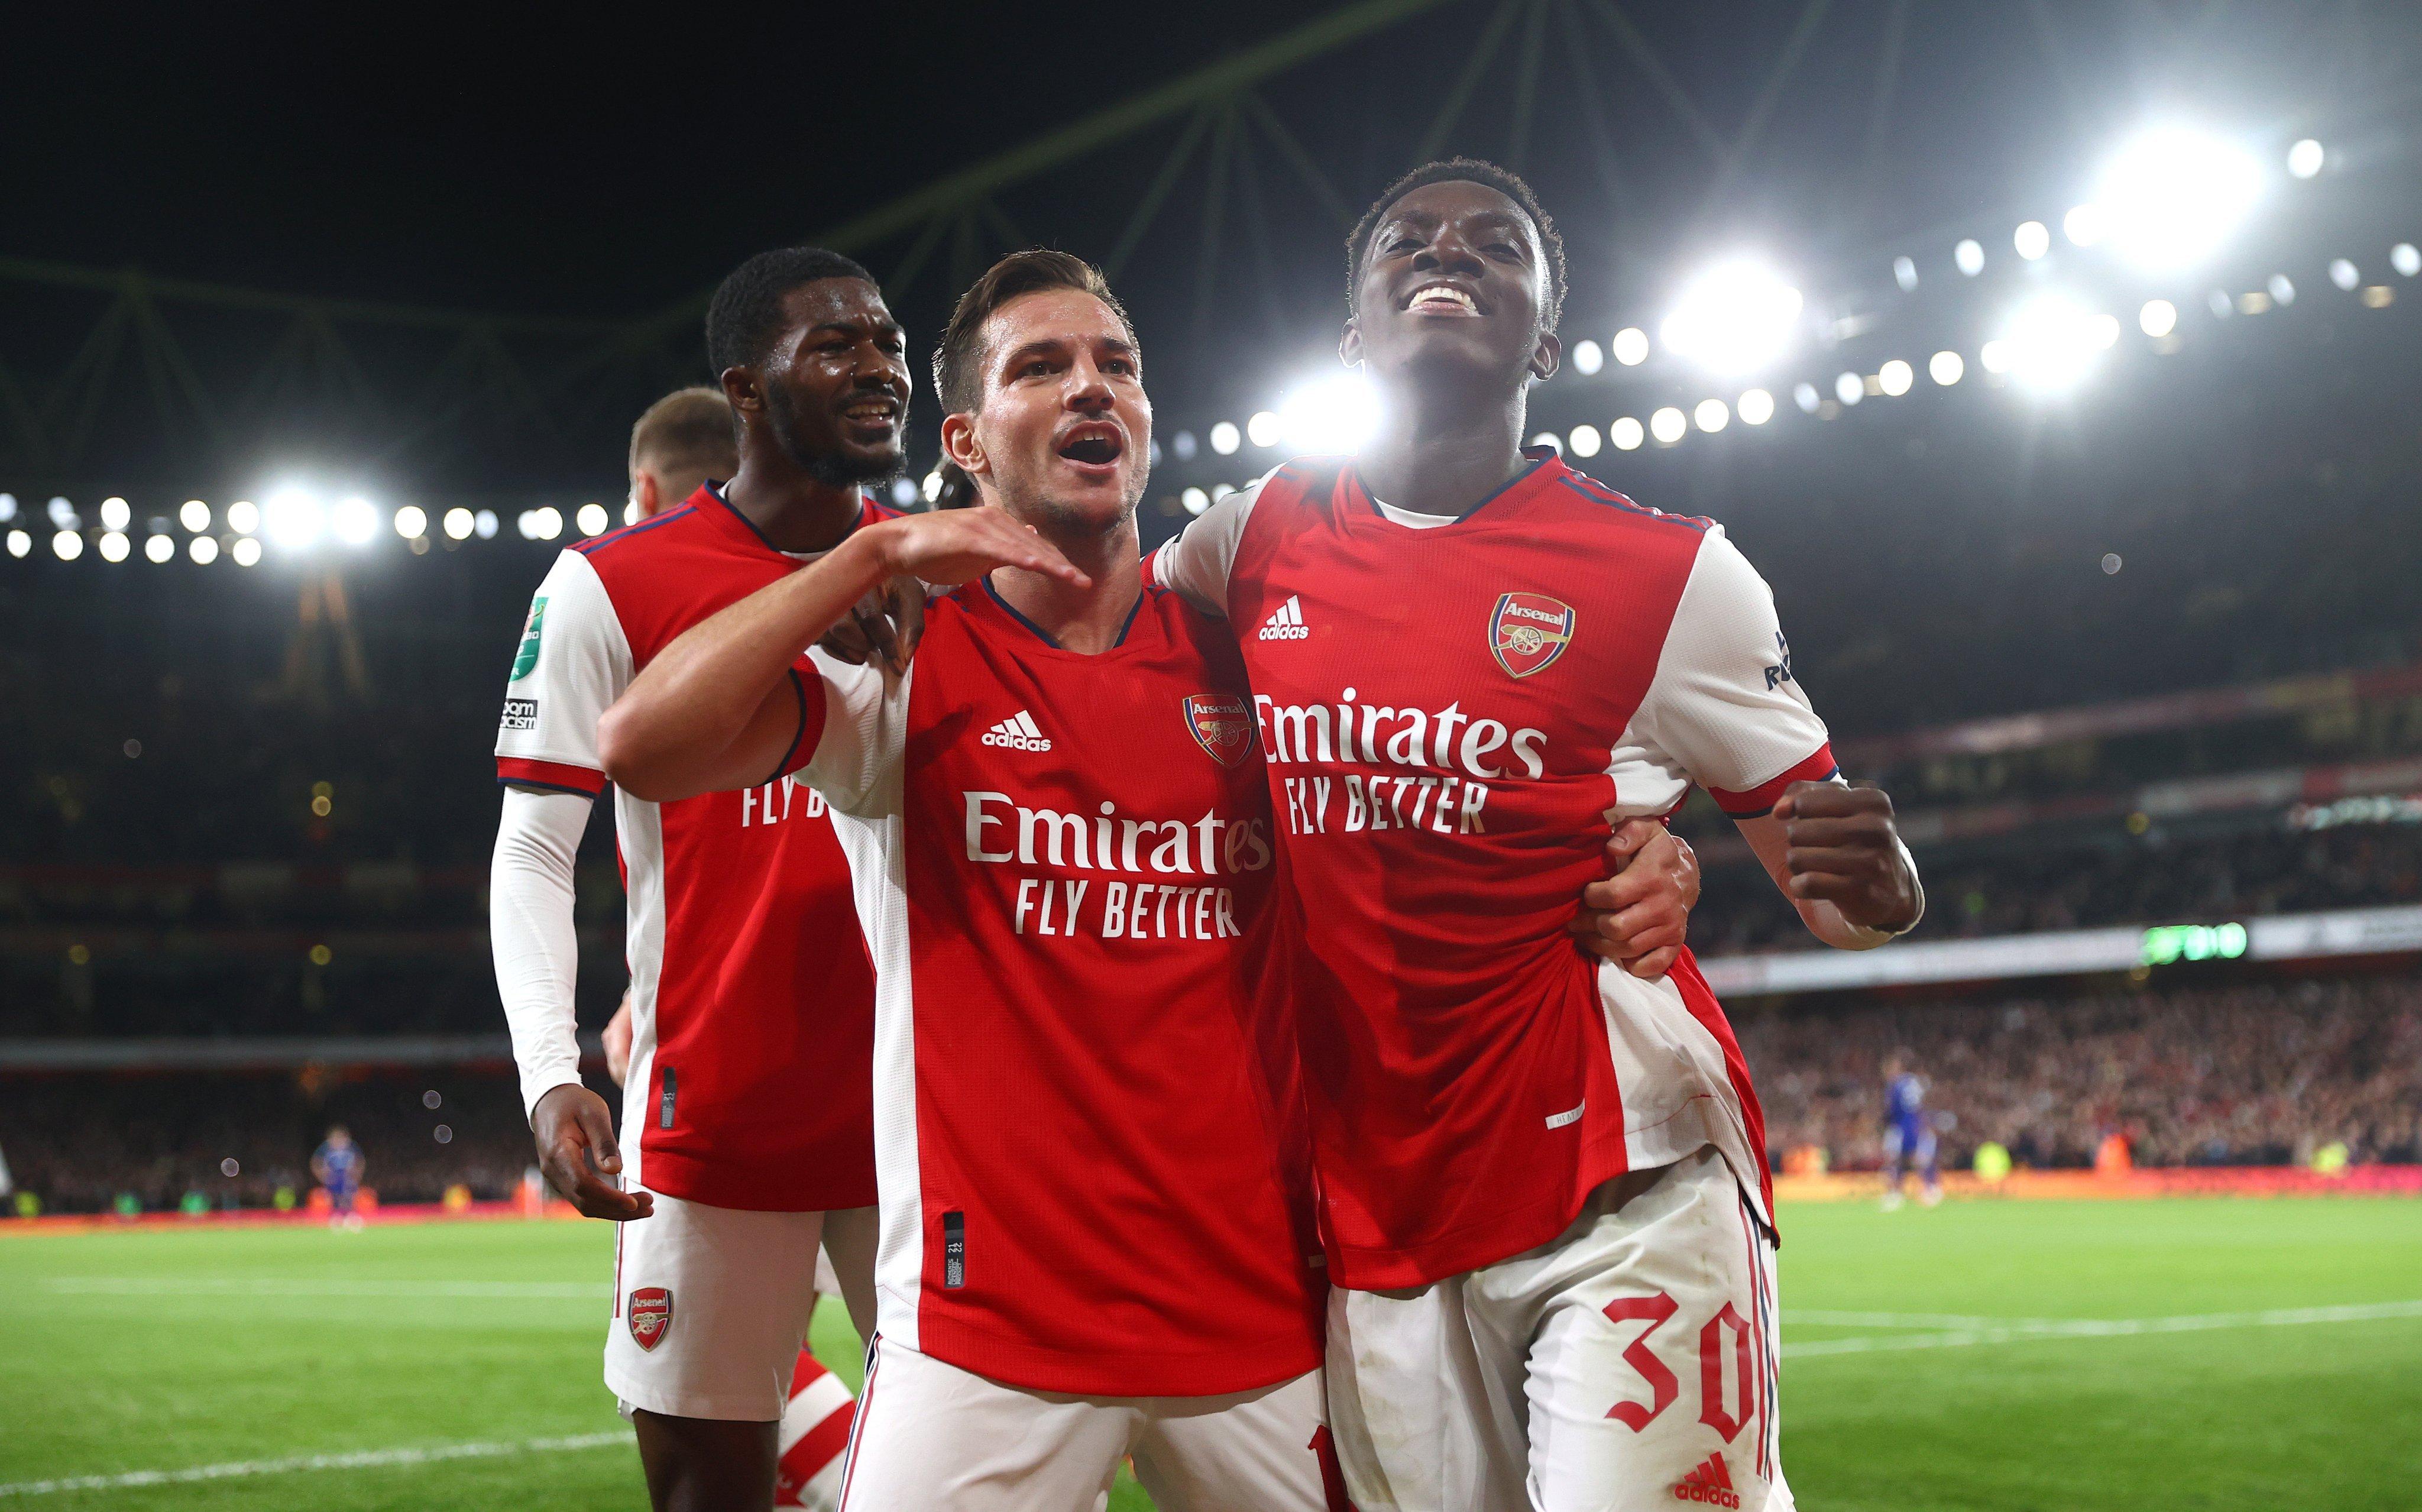 Hasil Piala Liga Inggris: Chelsea Menang Adu Penalti, Arsenal Pecundangi Leeds United - JPNN.com